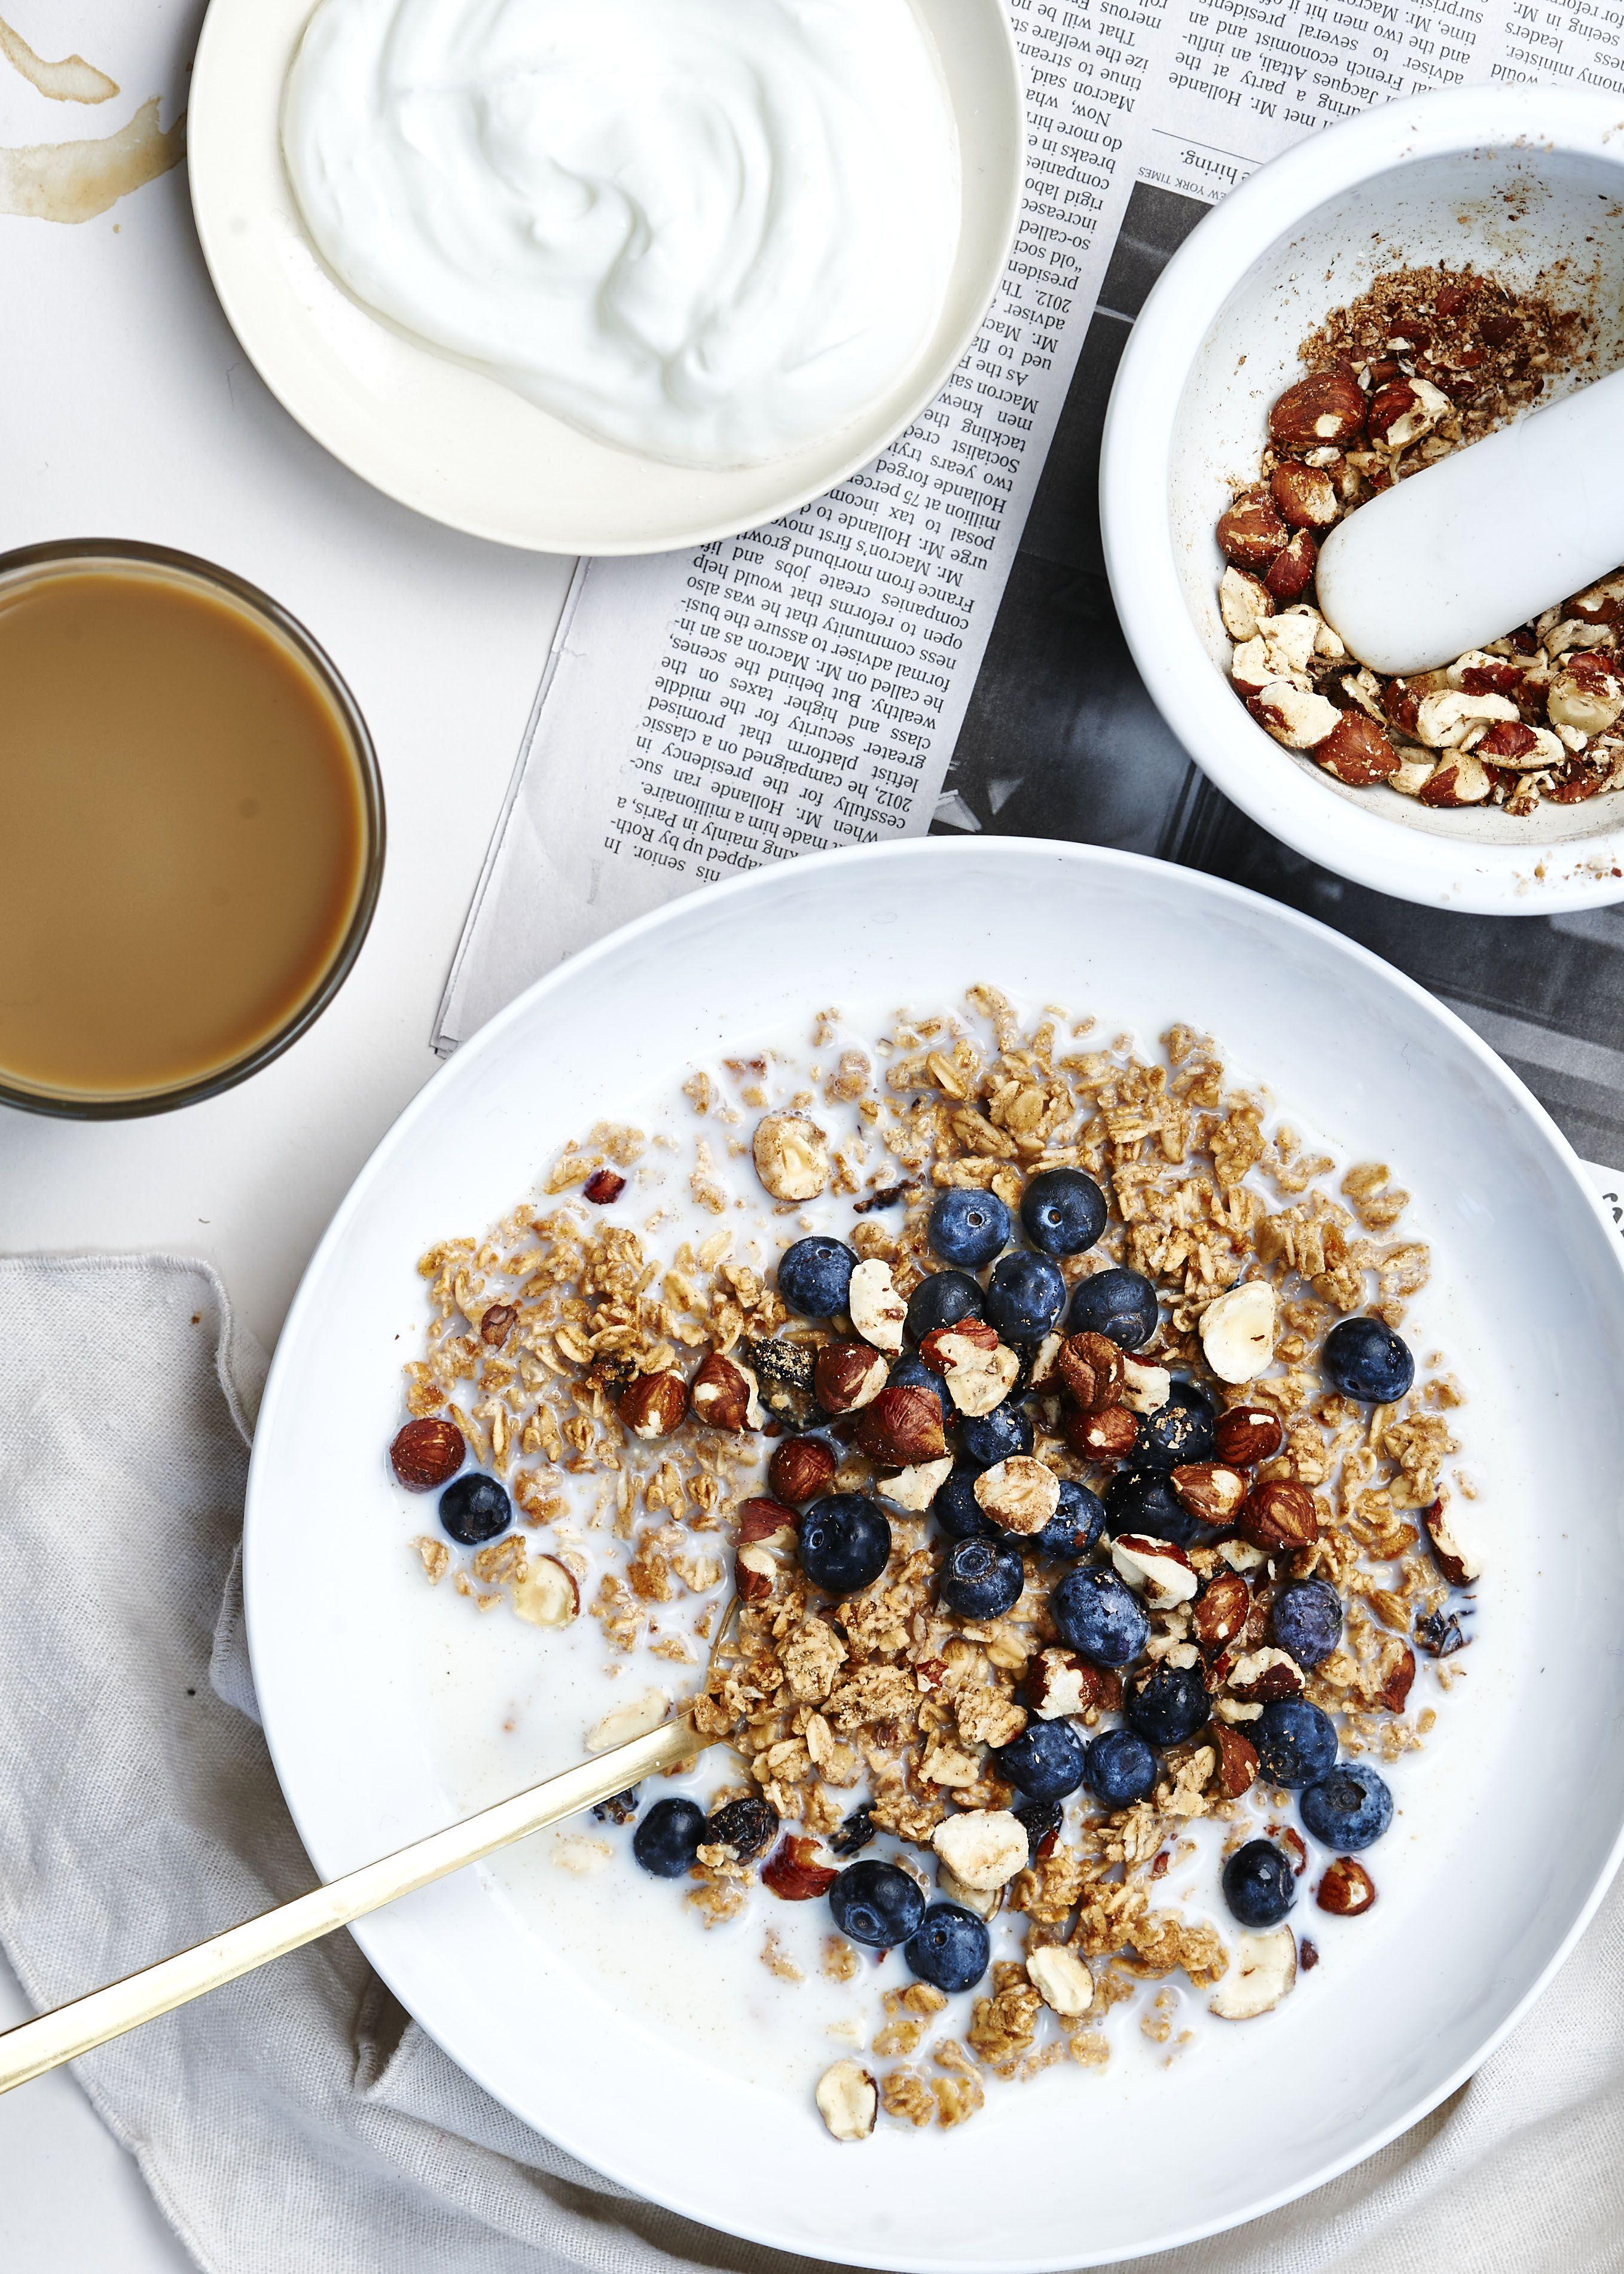 Perfect Morning (Granola with Hazlenuts & Blueberrys) www.issycroker.com